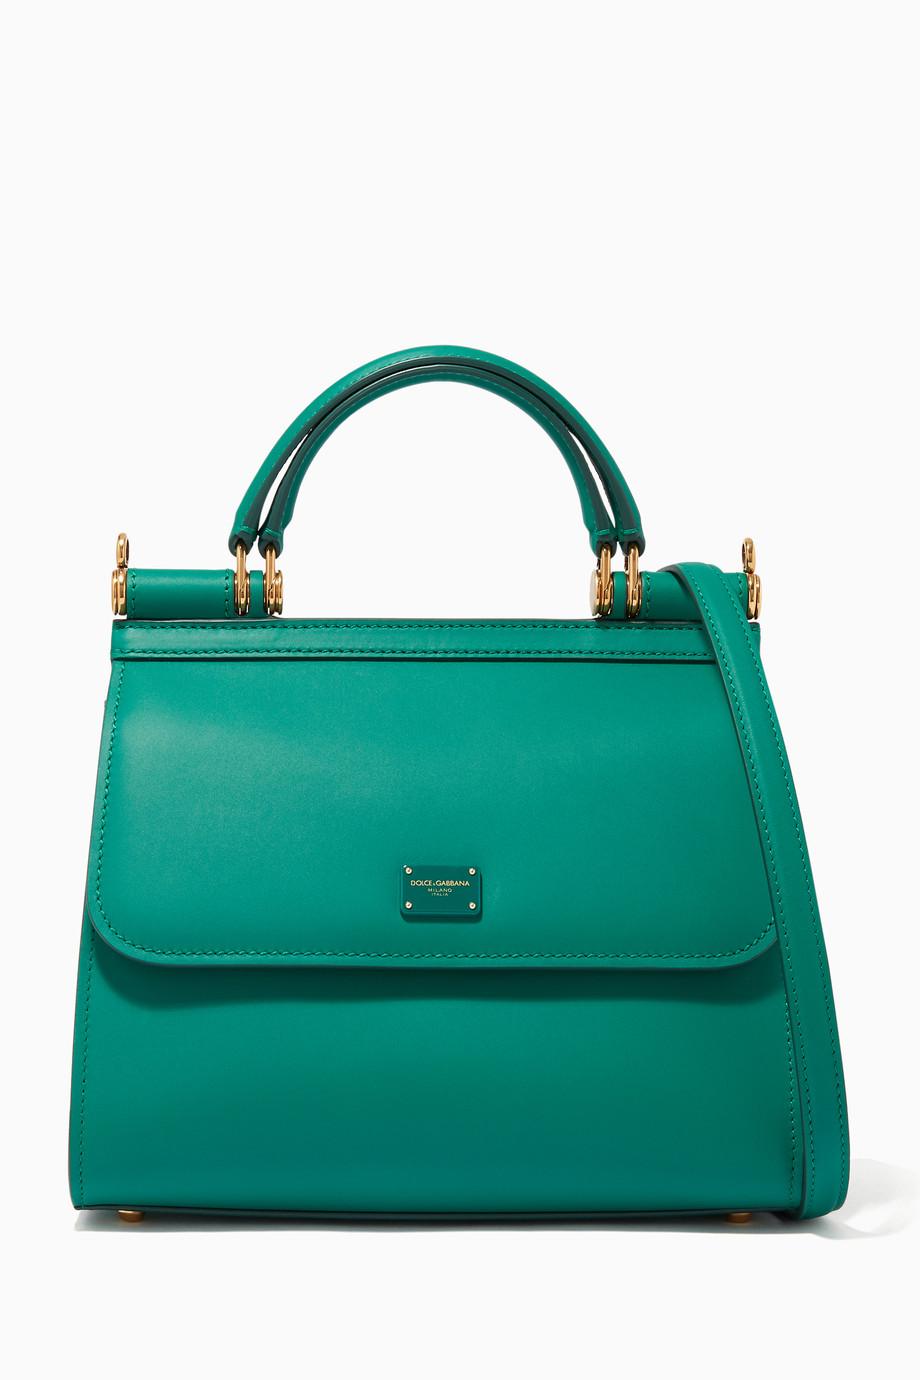 16555b11394 Shop Dolce & Gabbana Green Sicily 58 Small Calfskin Bag for Women ...